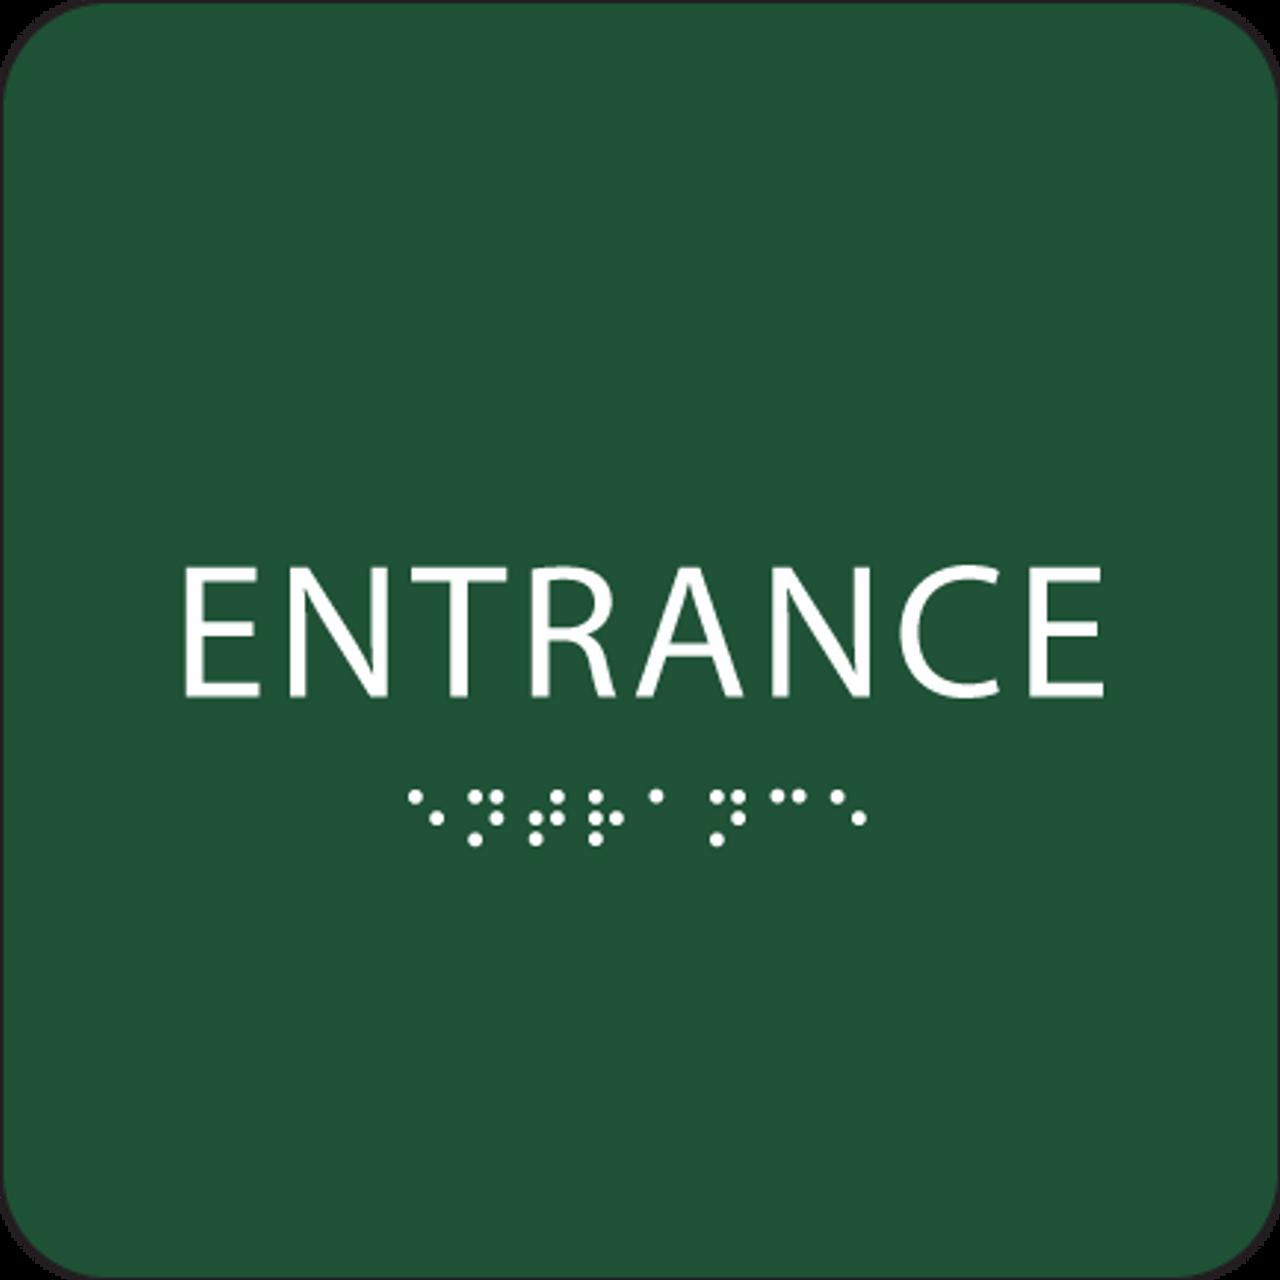 Green Tactile Entrance Sign